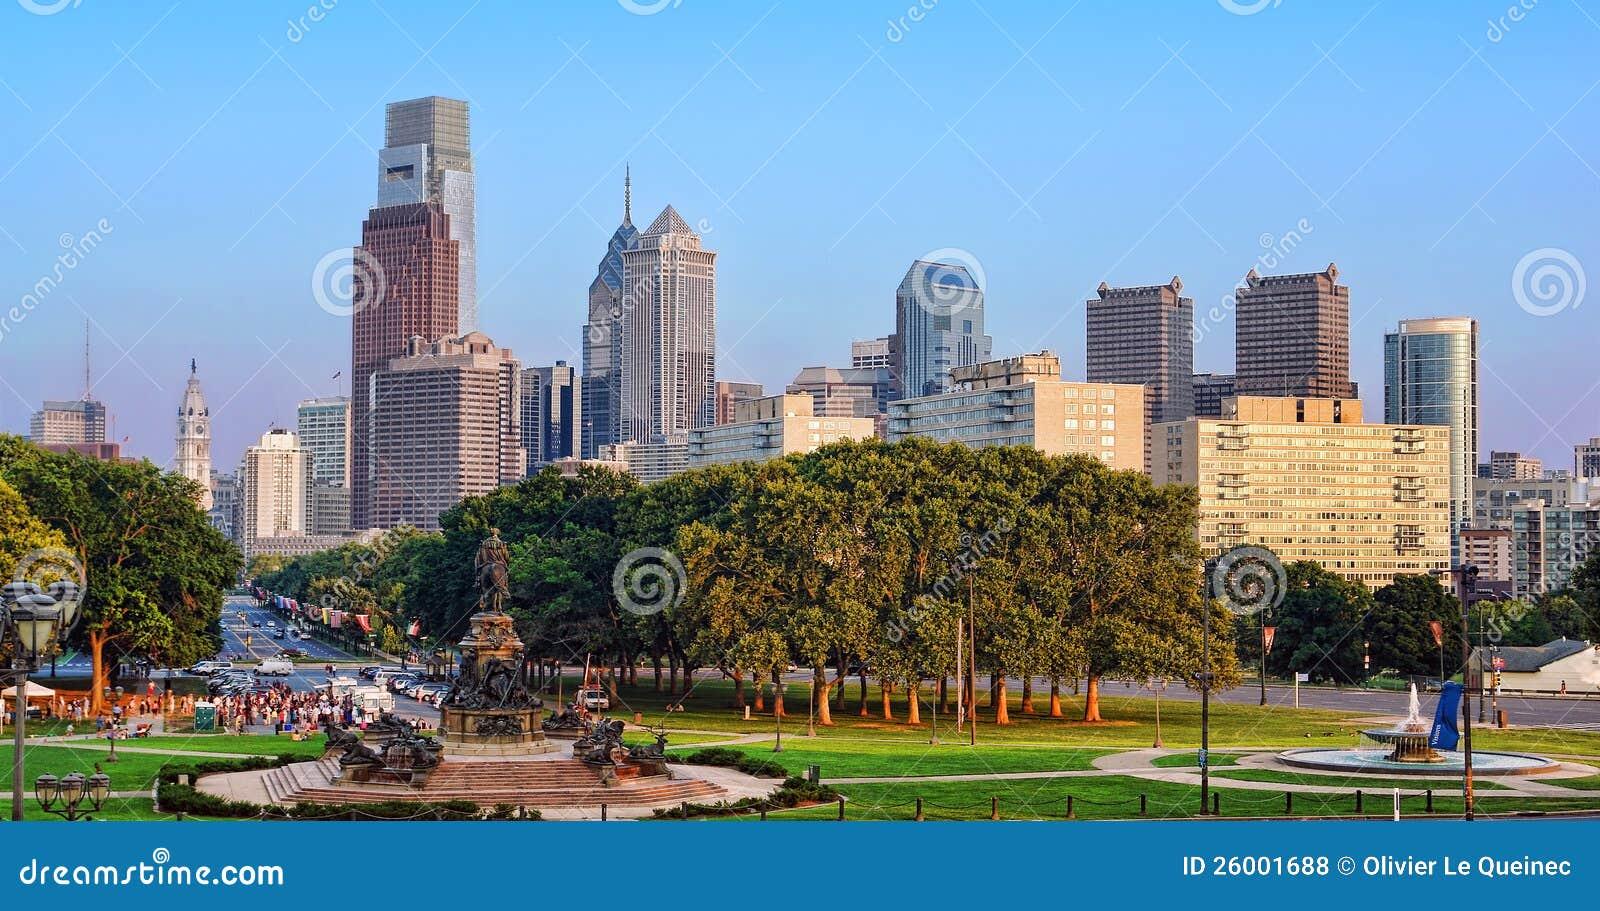 Downtown Philadelphia PA Cityscape City Skyline